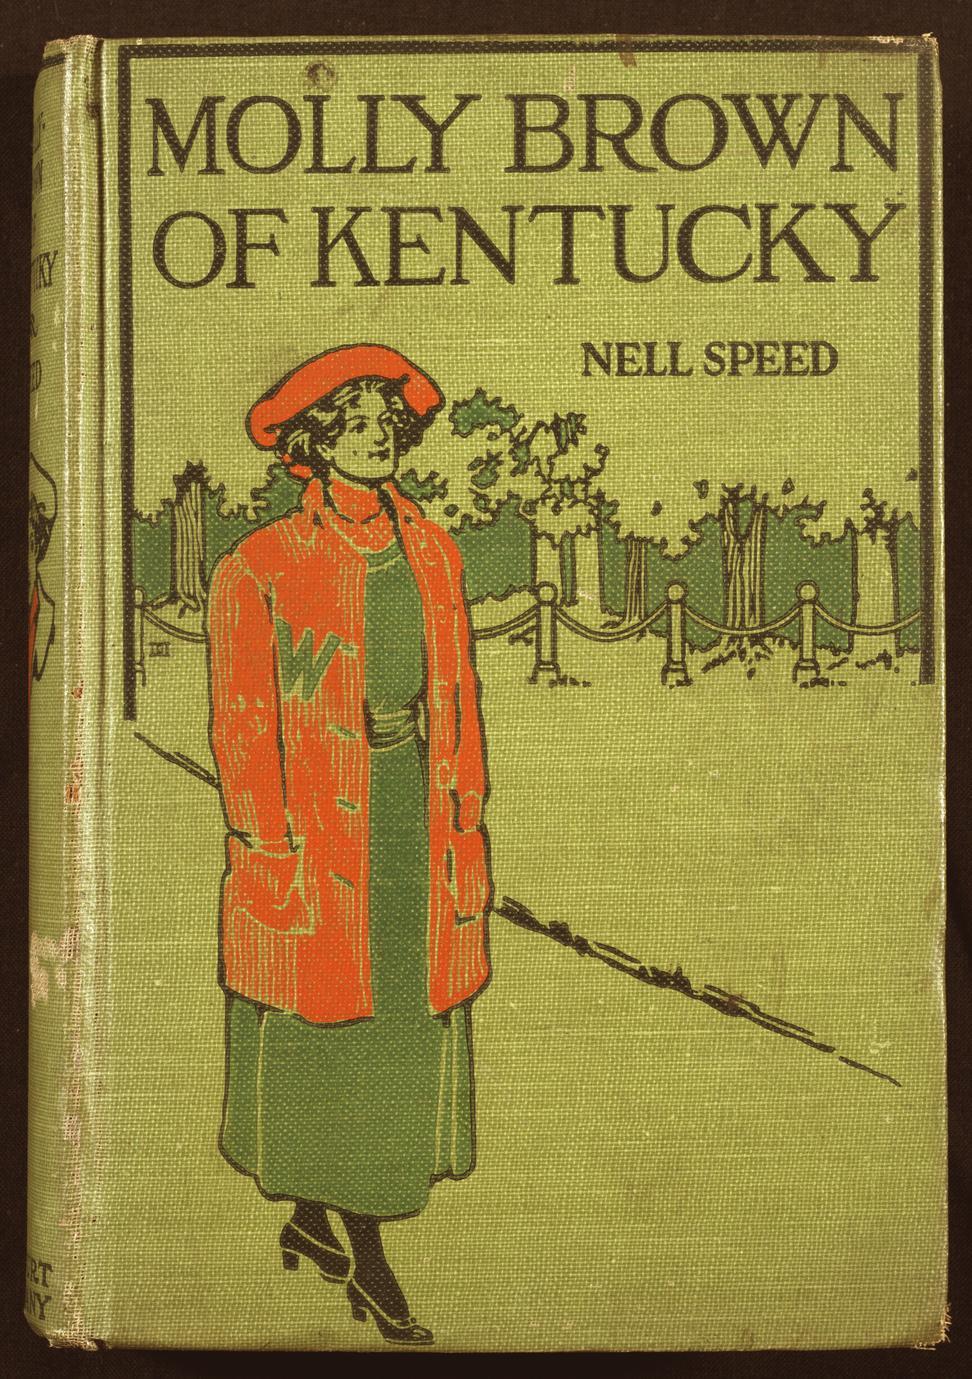 Molly Brown of Kentucky (1 of 3)